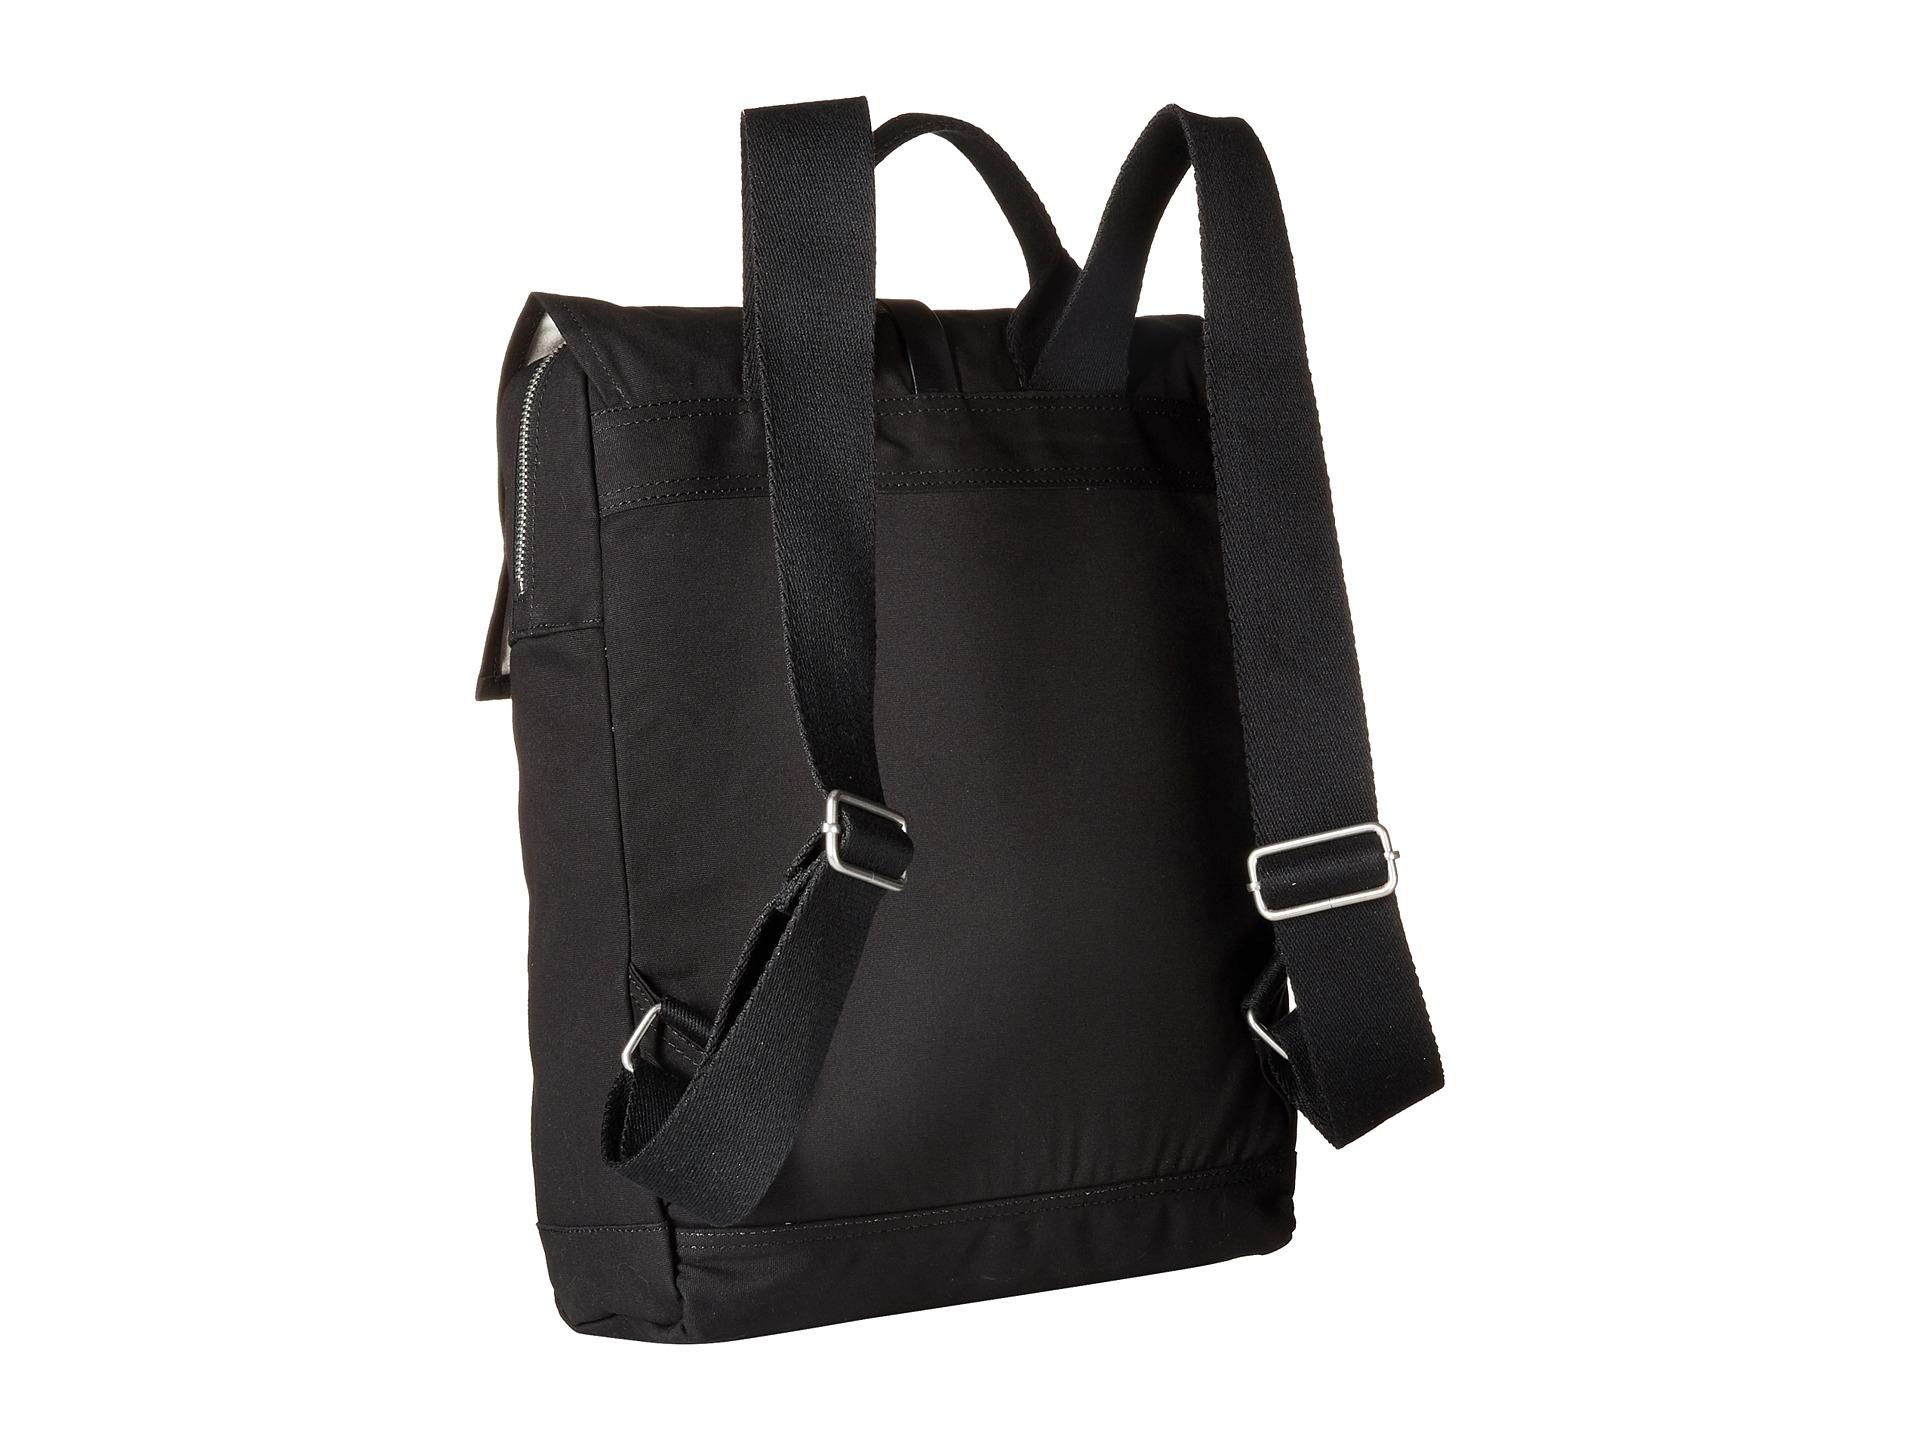 e35f4c6443c Toms Utility Canvas Trekker Backpack- Fenix Toulouse Handball